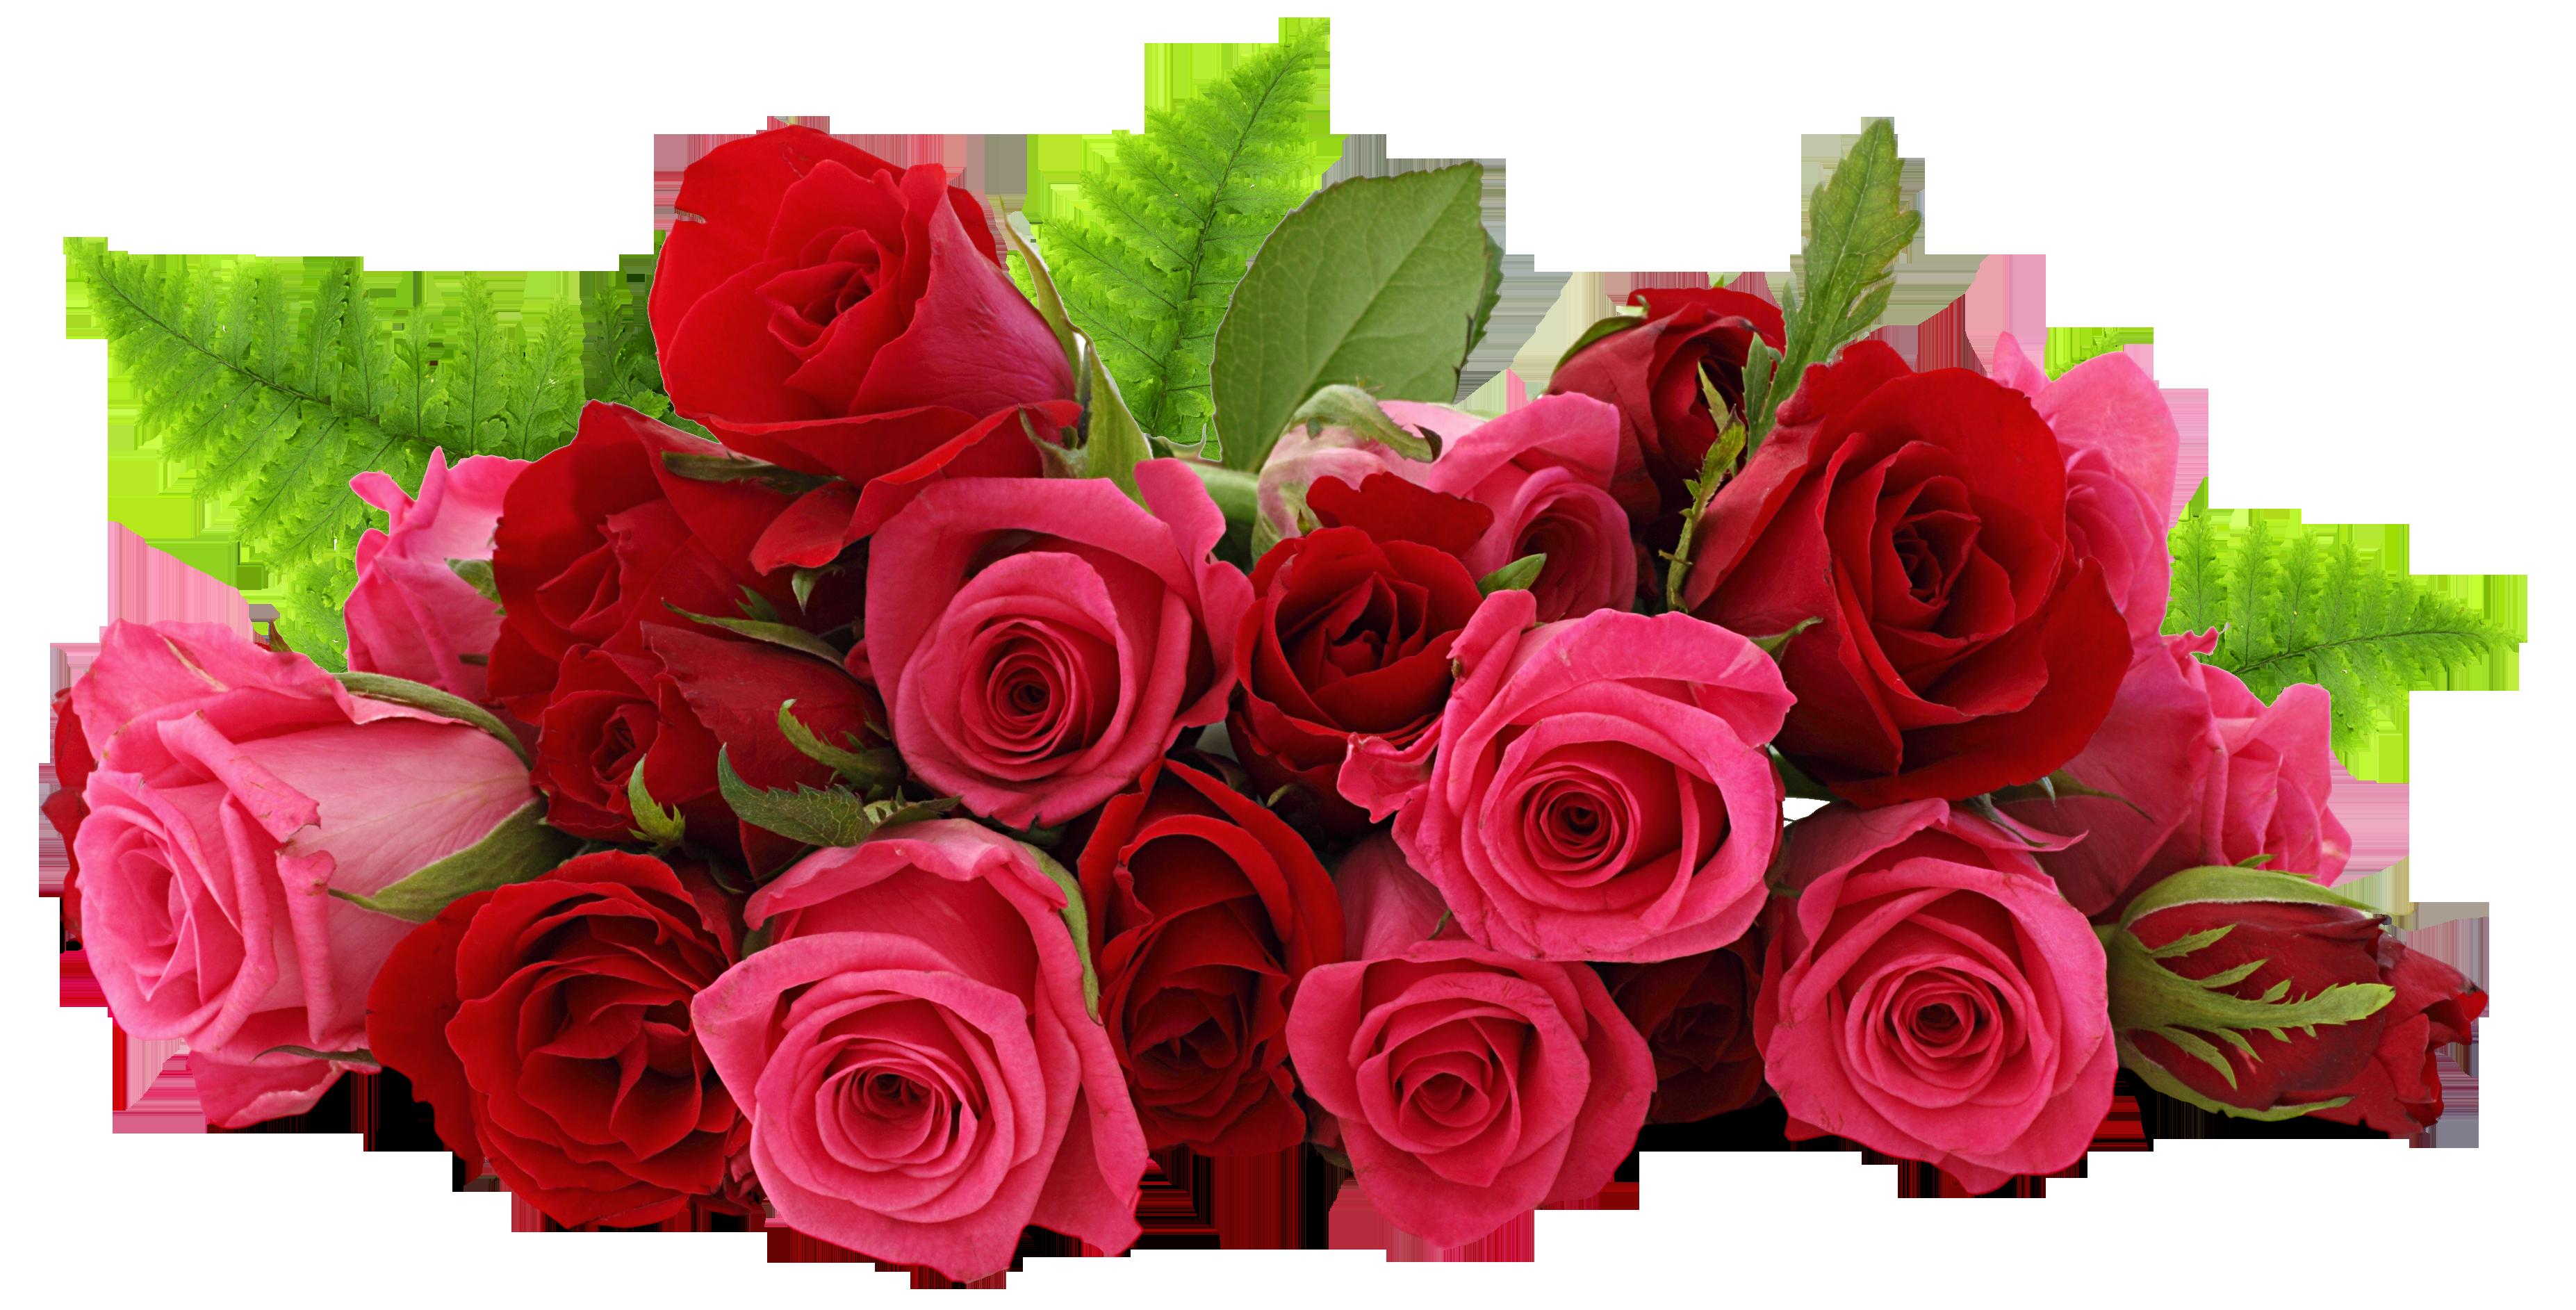 Rose clip art trees. Transparent png images roses